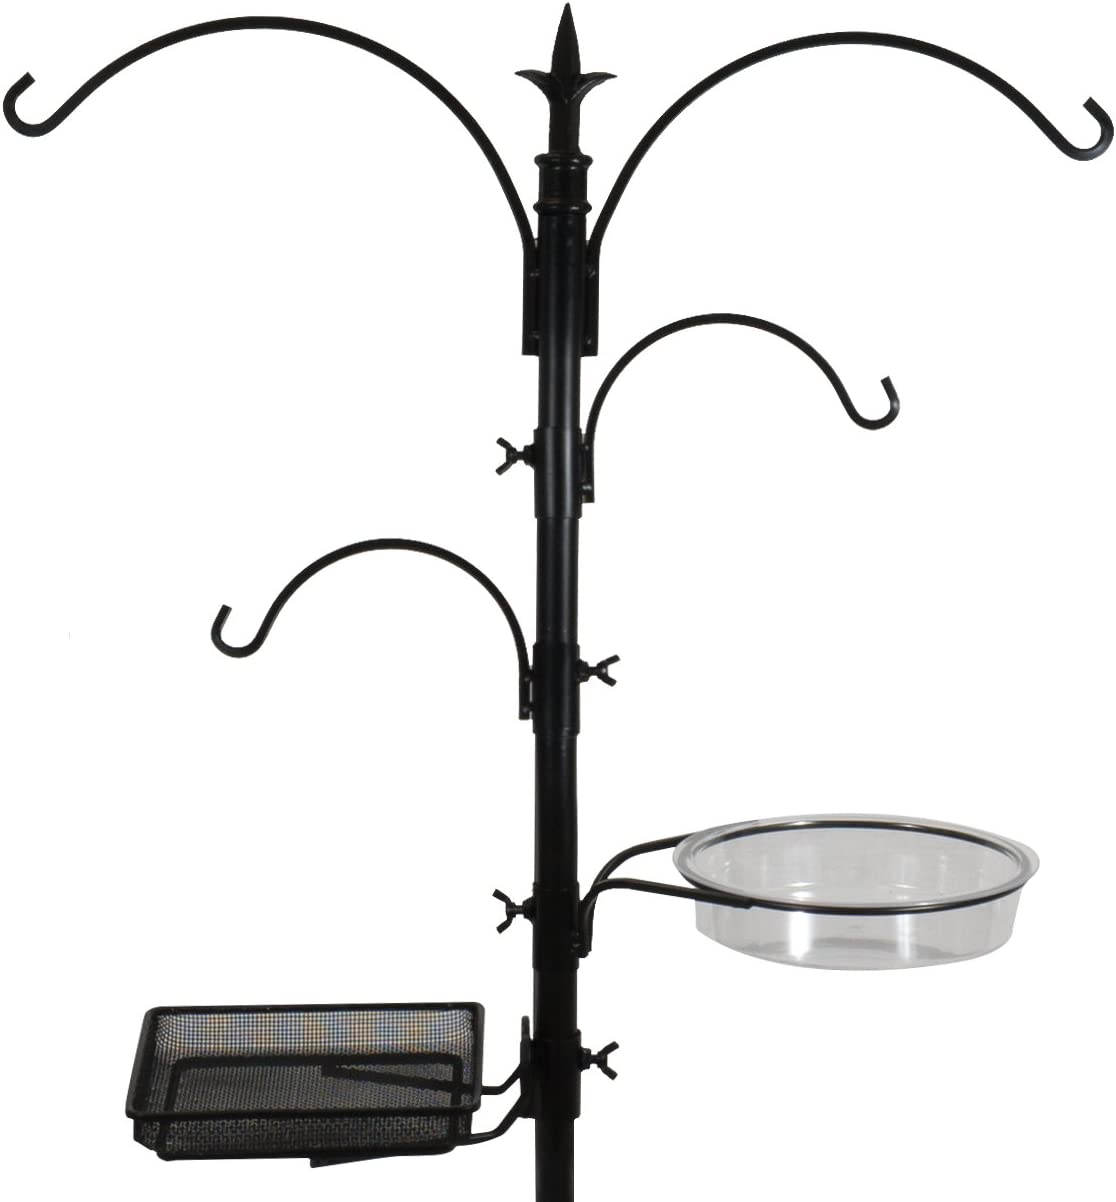 Sorbus Bird Feeding Bath Station, Metal Deck Pole for Bird Feeders, Great for Attracting Birds Outdoors, Backyard, Garden (Bird Bath Feeder Station - Black)